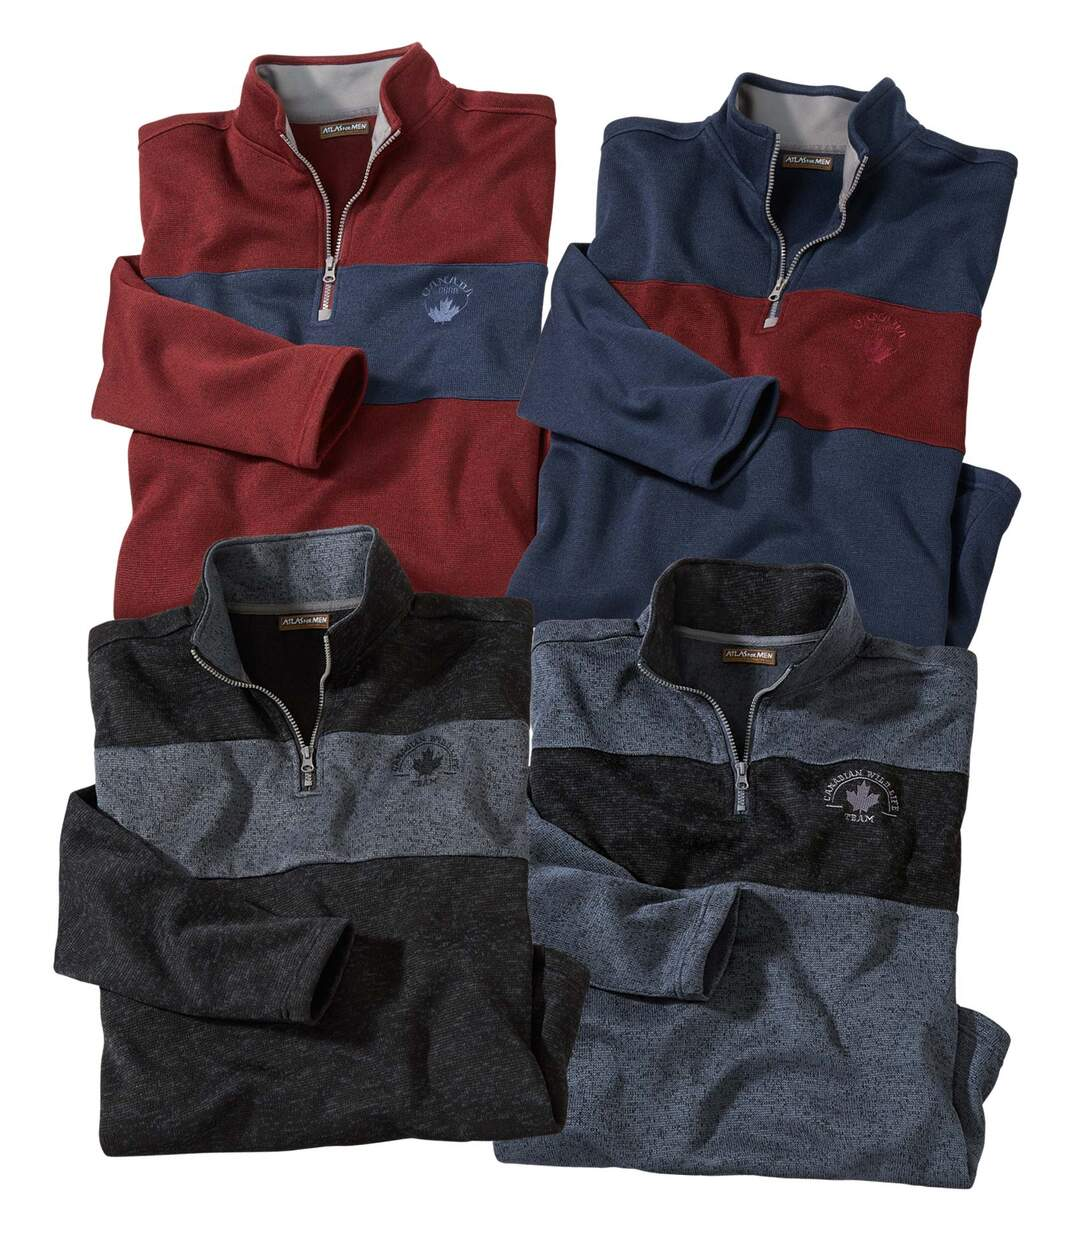 Pack of 4 Men's Brushed Fleece Jumpers